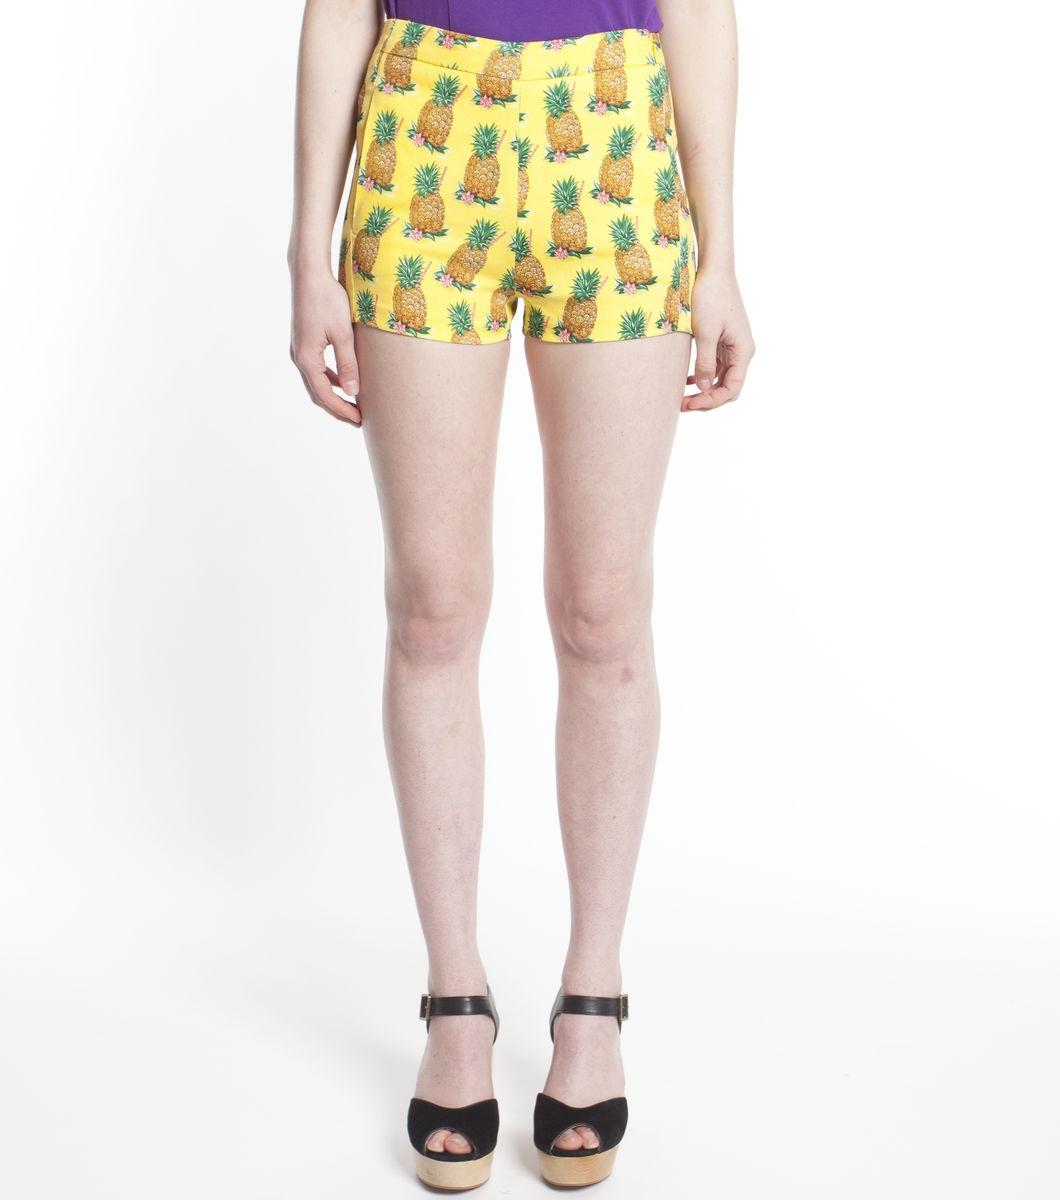 Calypso shorts